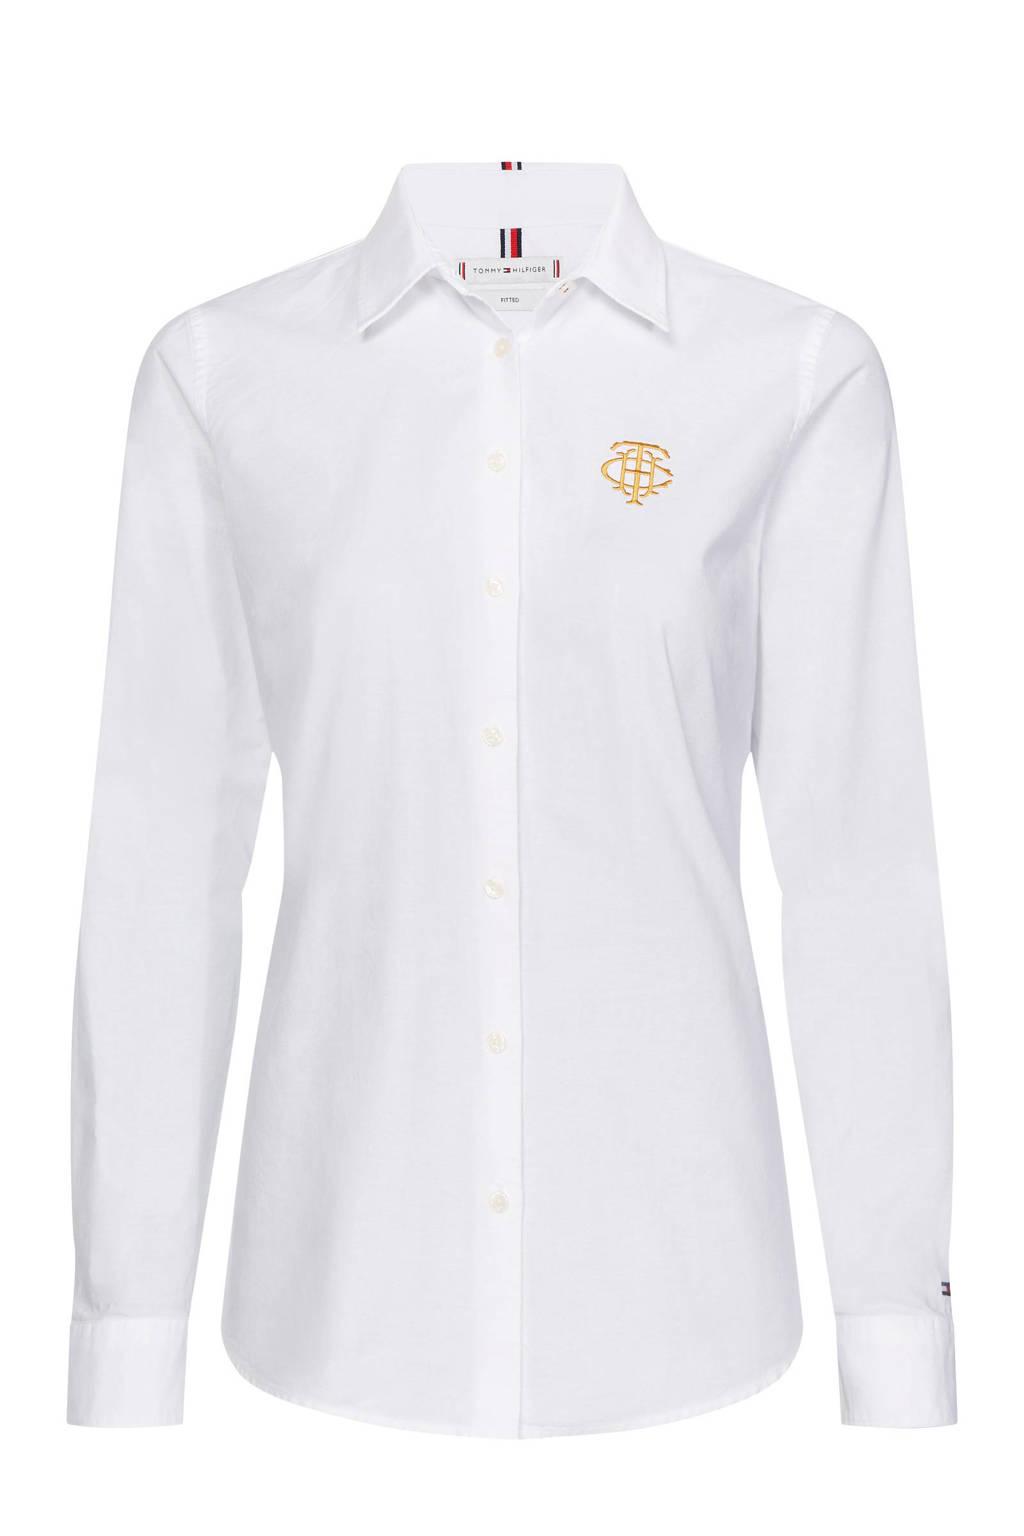 Tommy Hilfiger blouse met borduursels wit, Wit